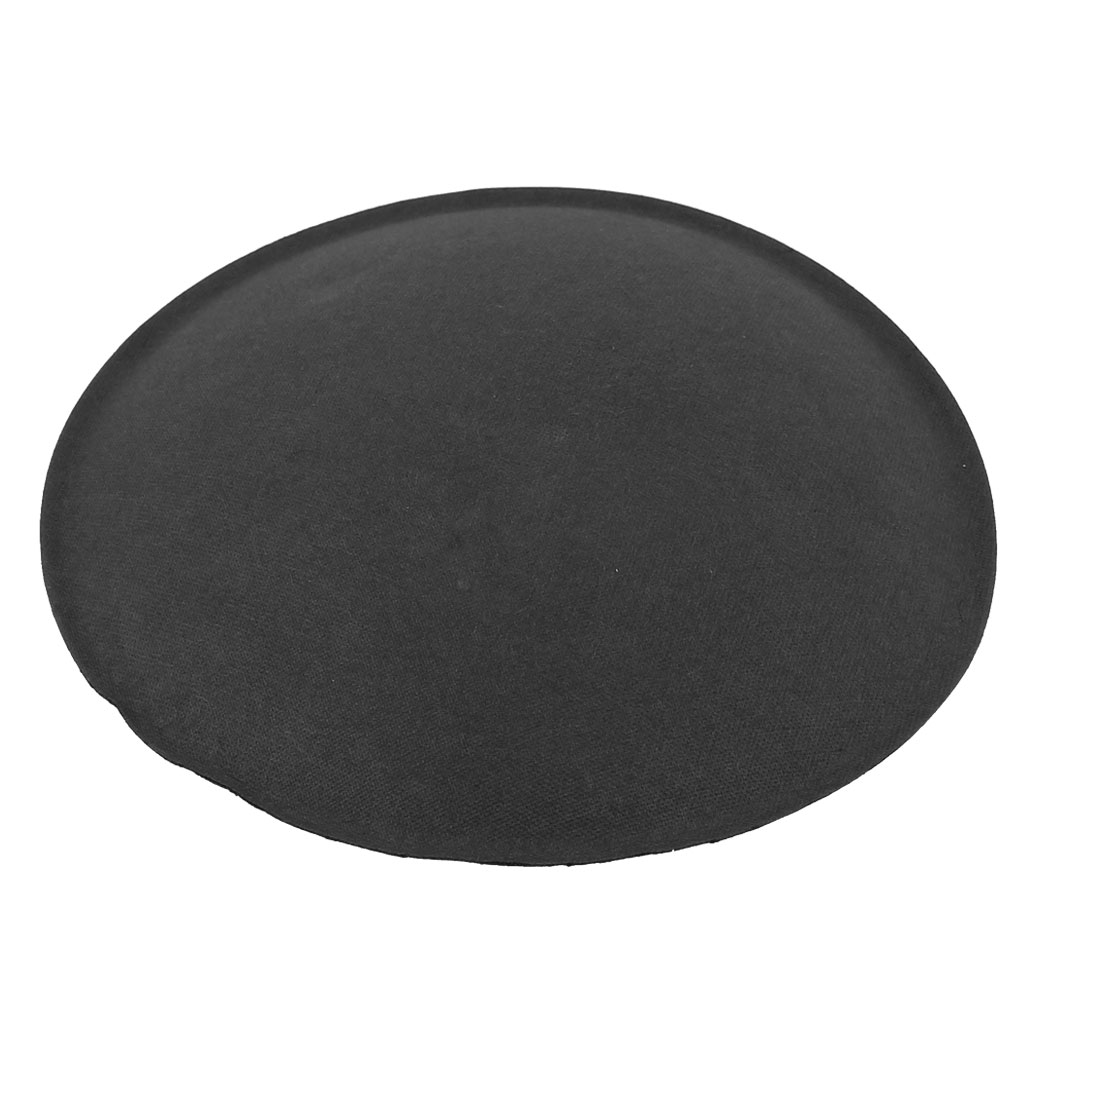 150mm Dia Dome Shape Audio Speaker Loudspeaker Subwoofer Dustproof Cover Cap